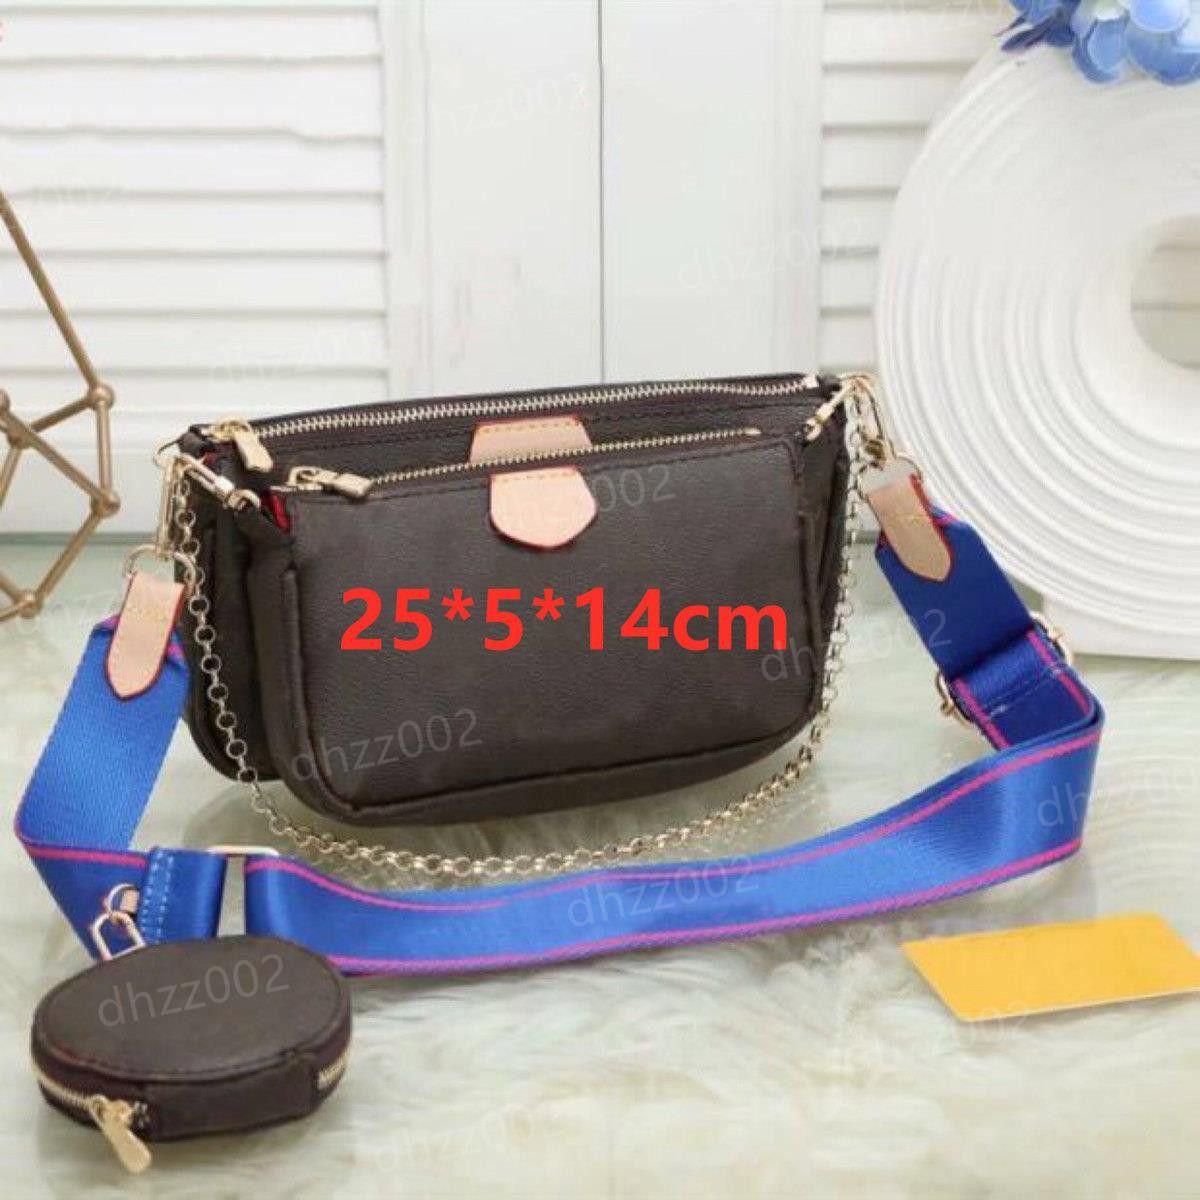 Louis Vuitton Novas mulheres mais como bolsas elegantes Multi-bolso Acessórios Purse L Flor Mini Bolsos 3 Bolsas Cross Bodes Bolsas De Ombro Wrgferge